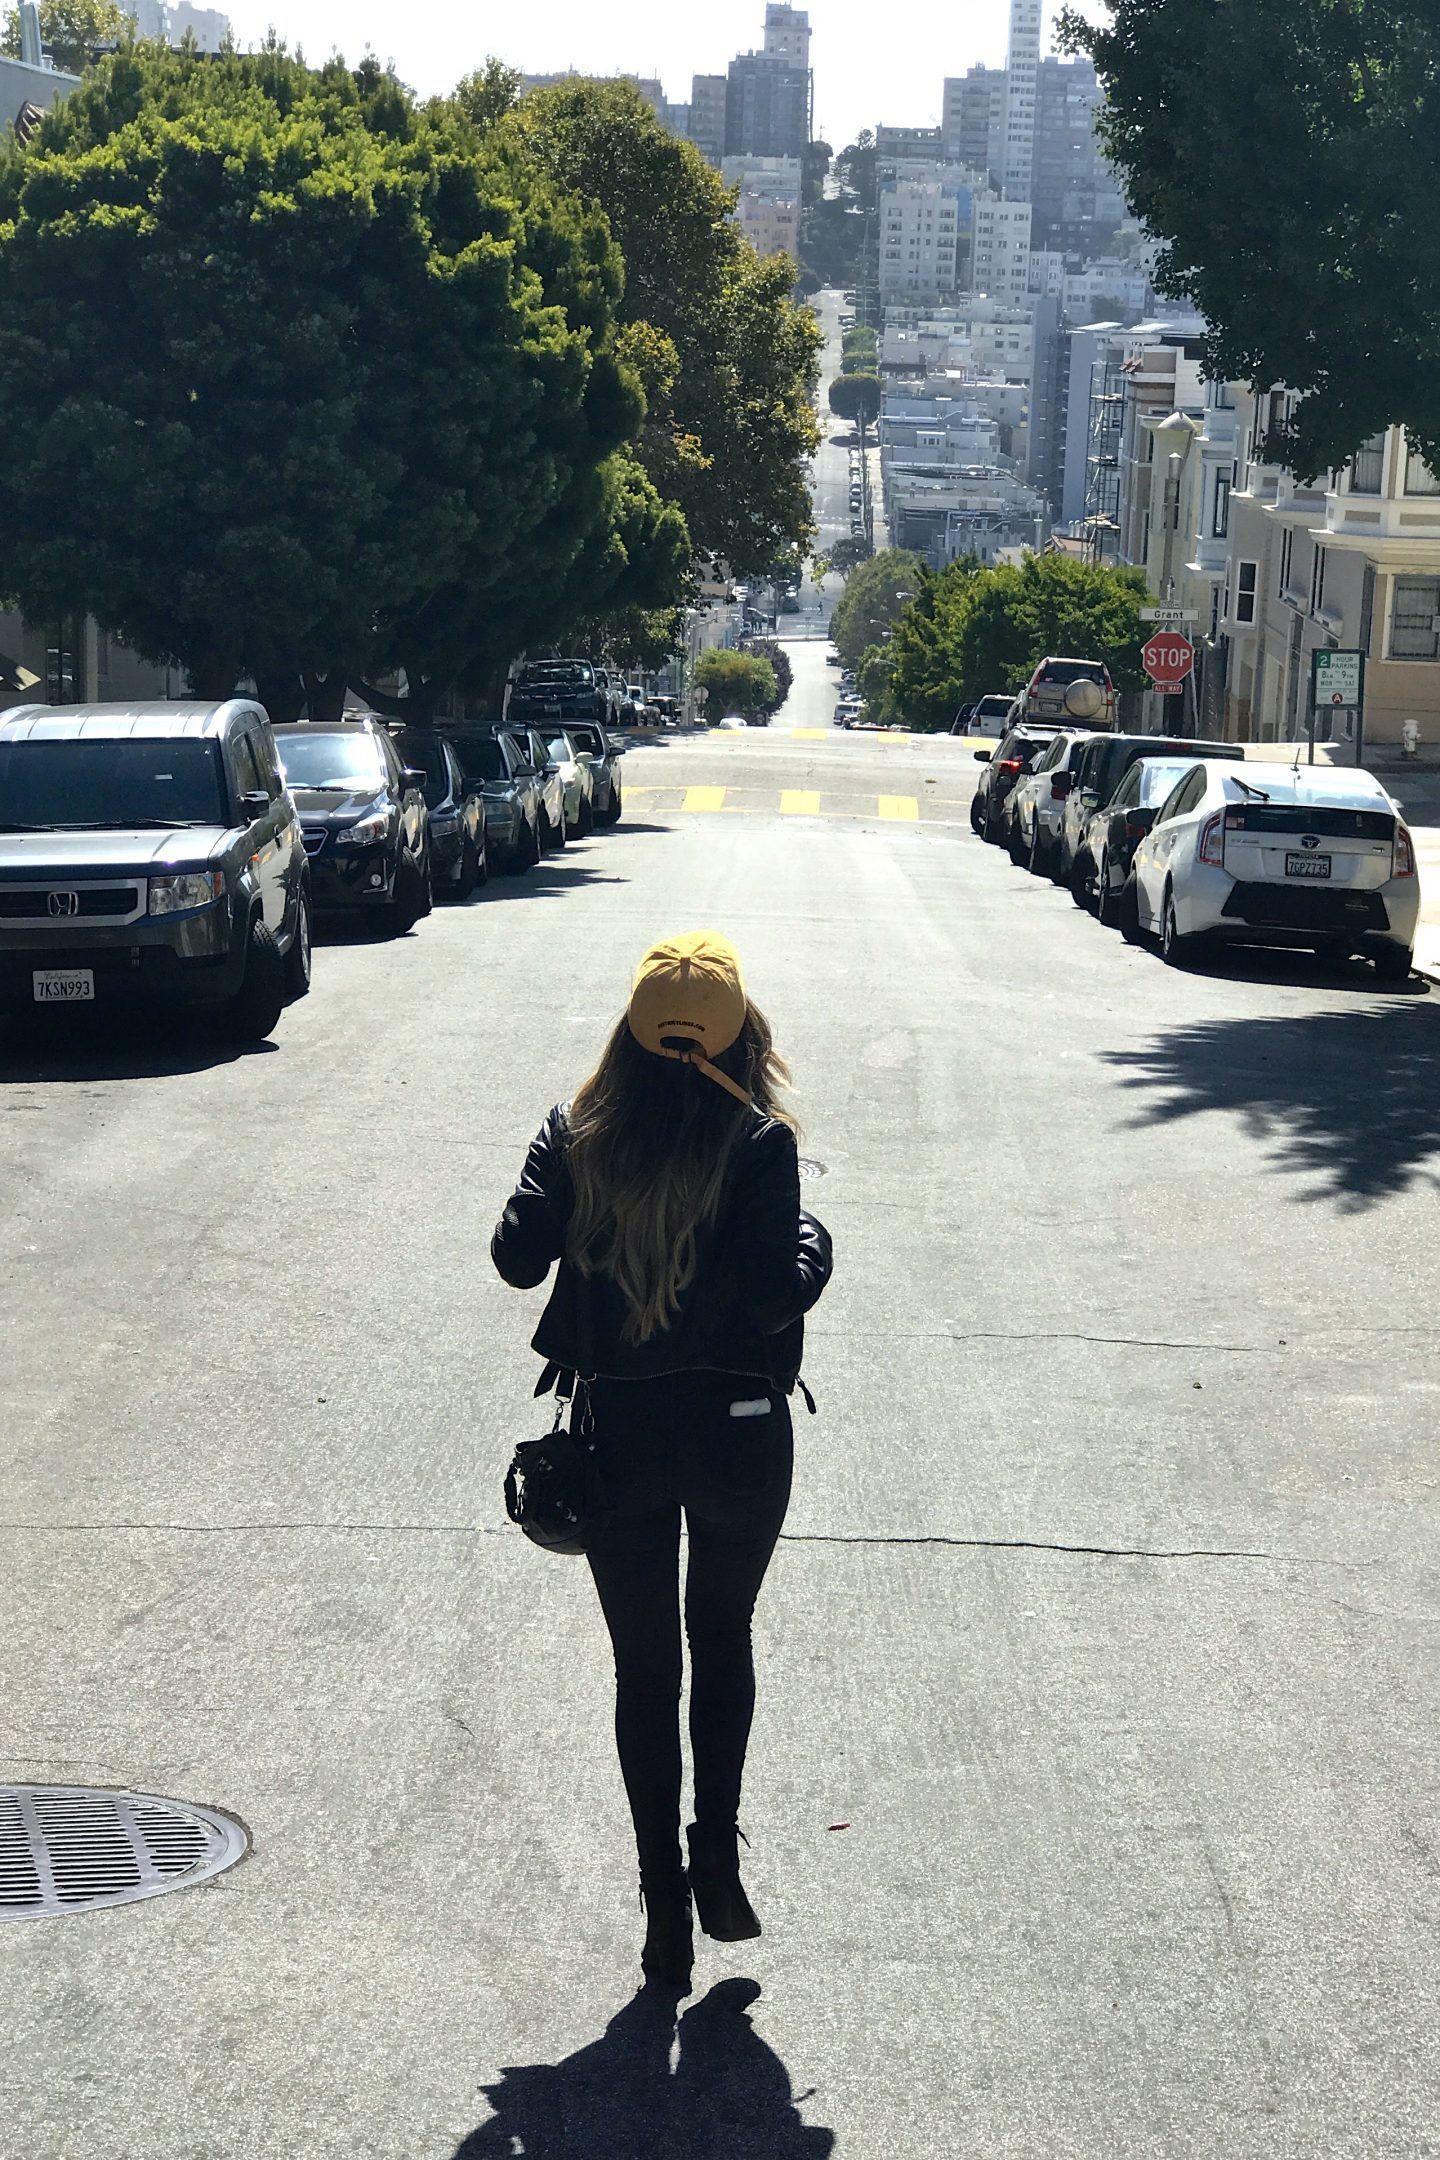 http://imtaramichelle.com San Francisco fashion, food & photography